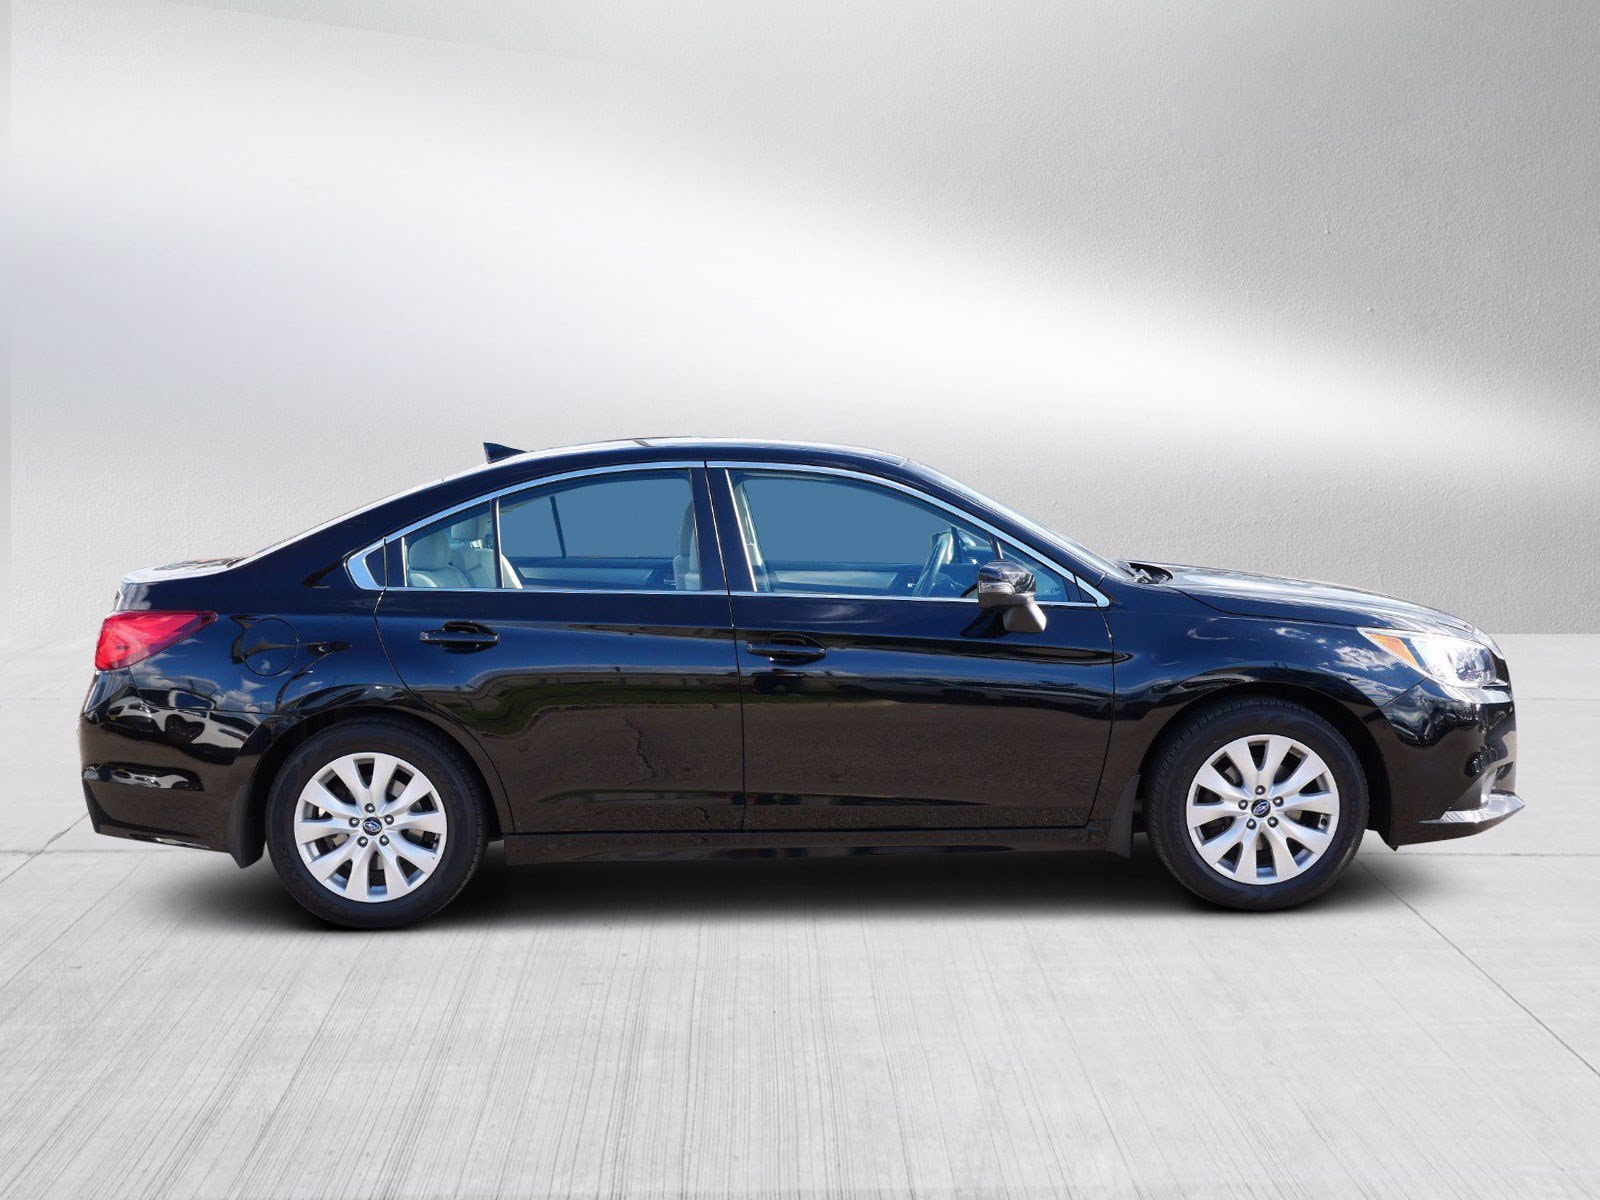 Used 2017 Subaru Legacy Premium with VIN 4S3BNAF63H3023973 for sale in Bloomington, Minnesota